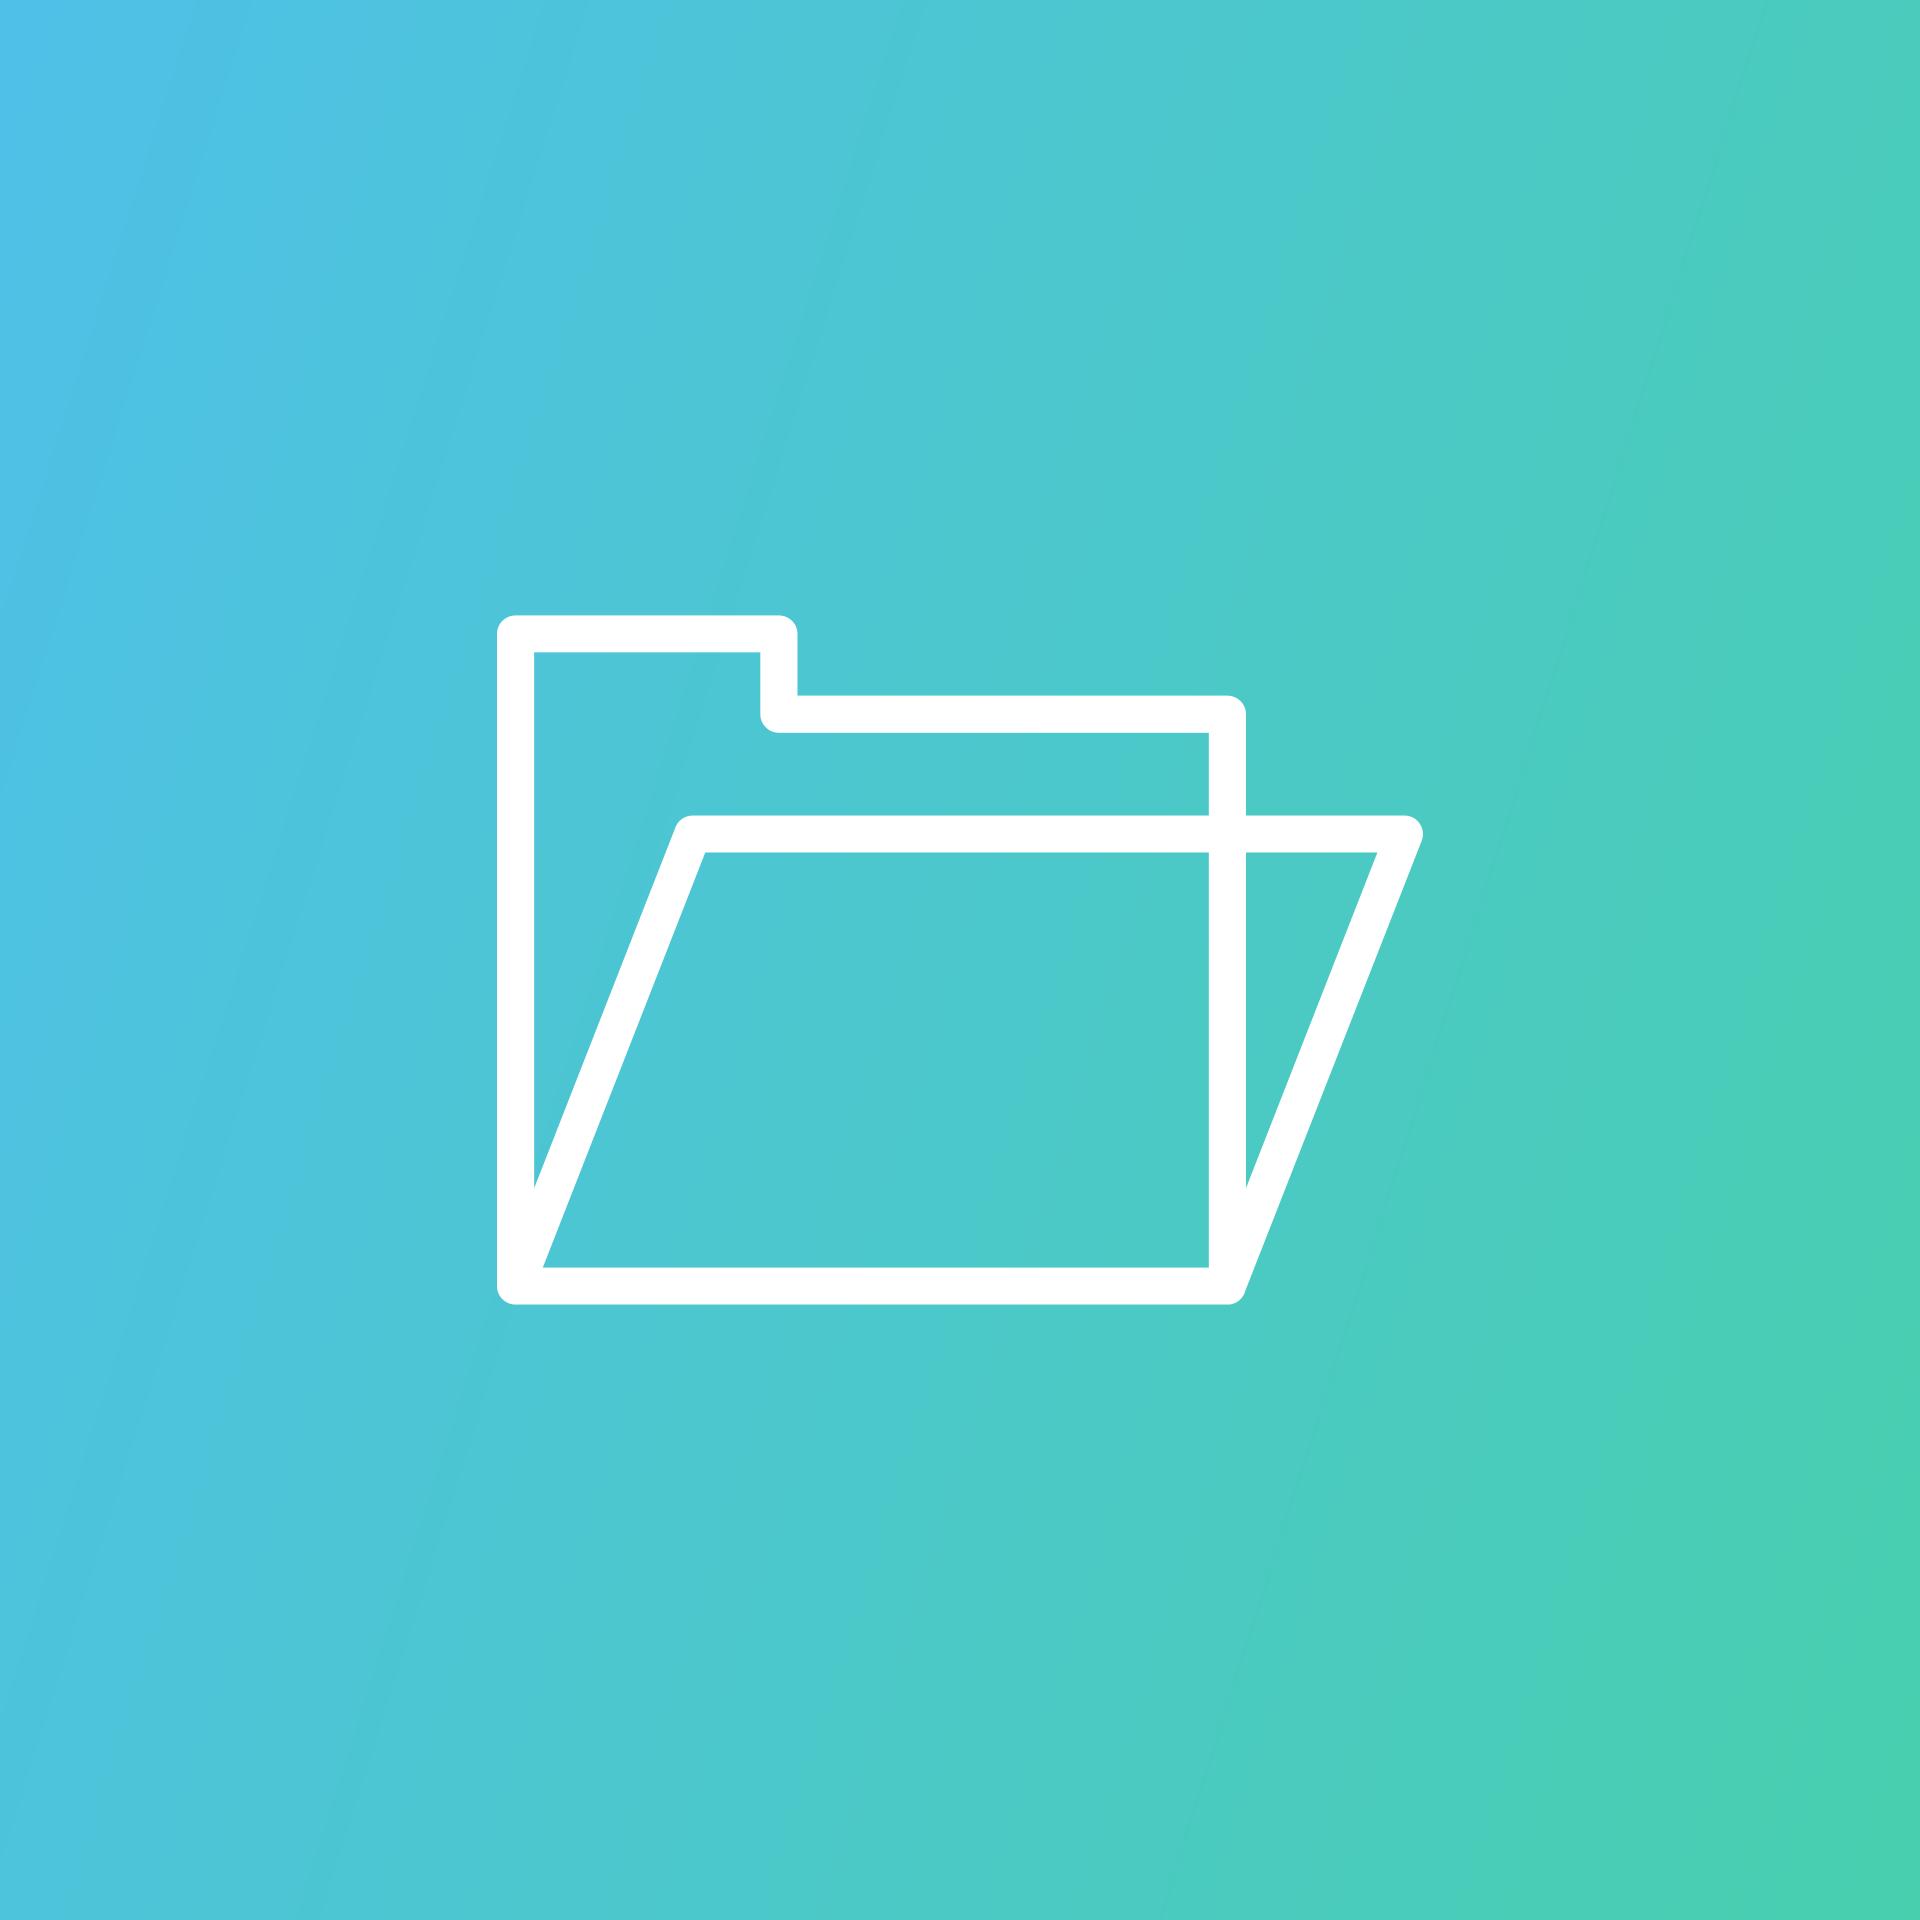 symbol folderu